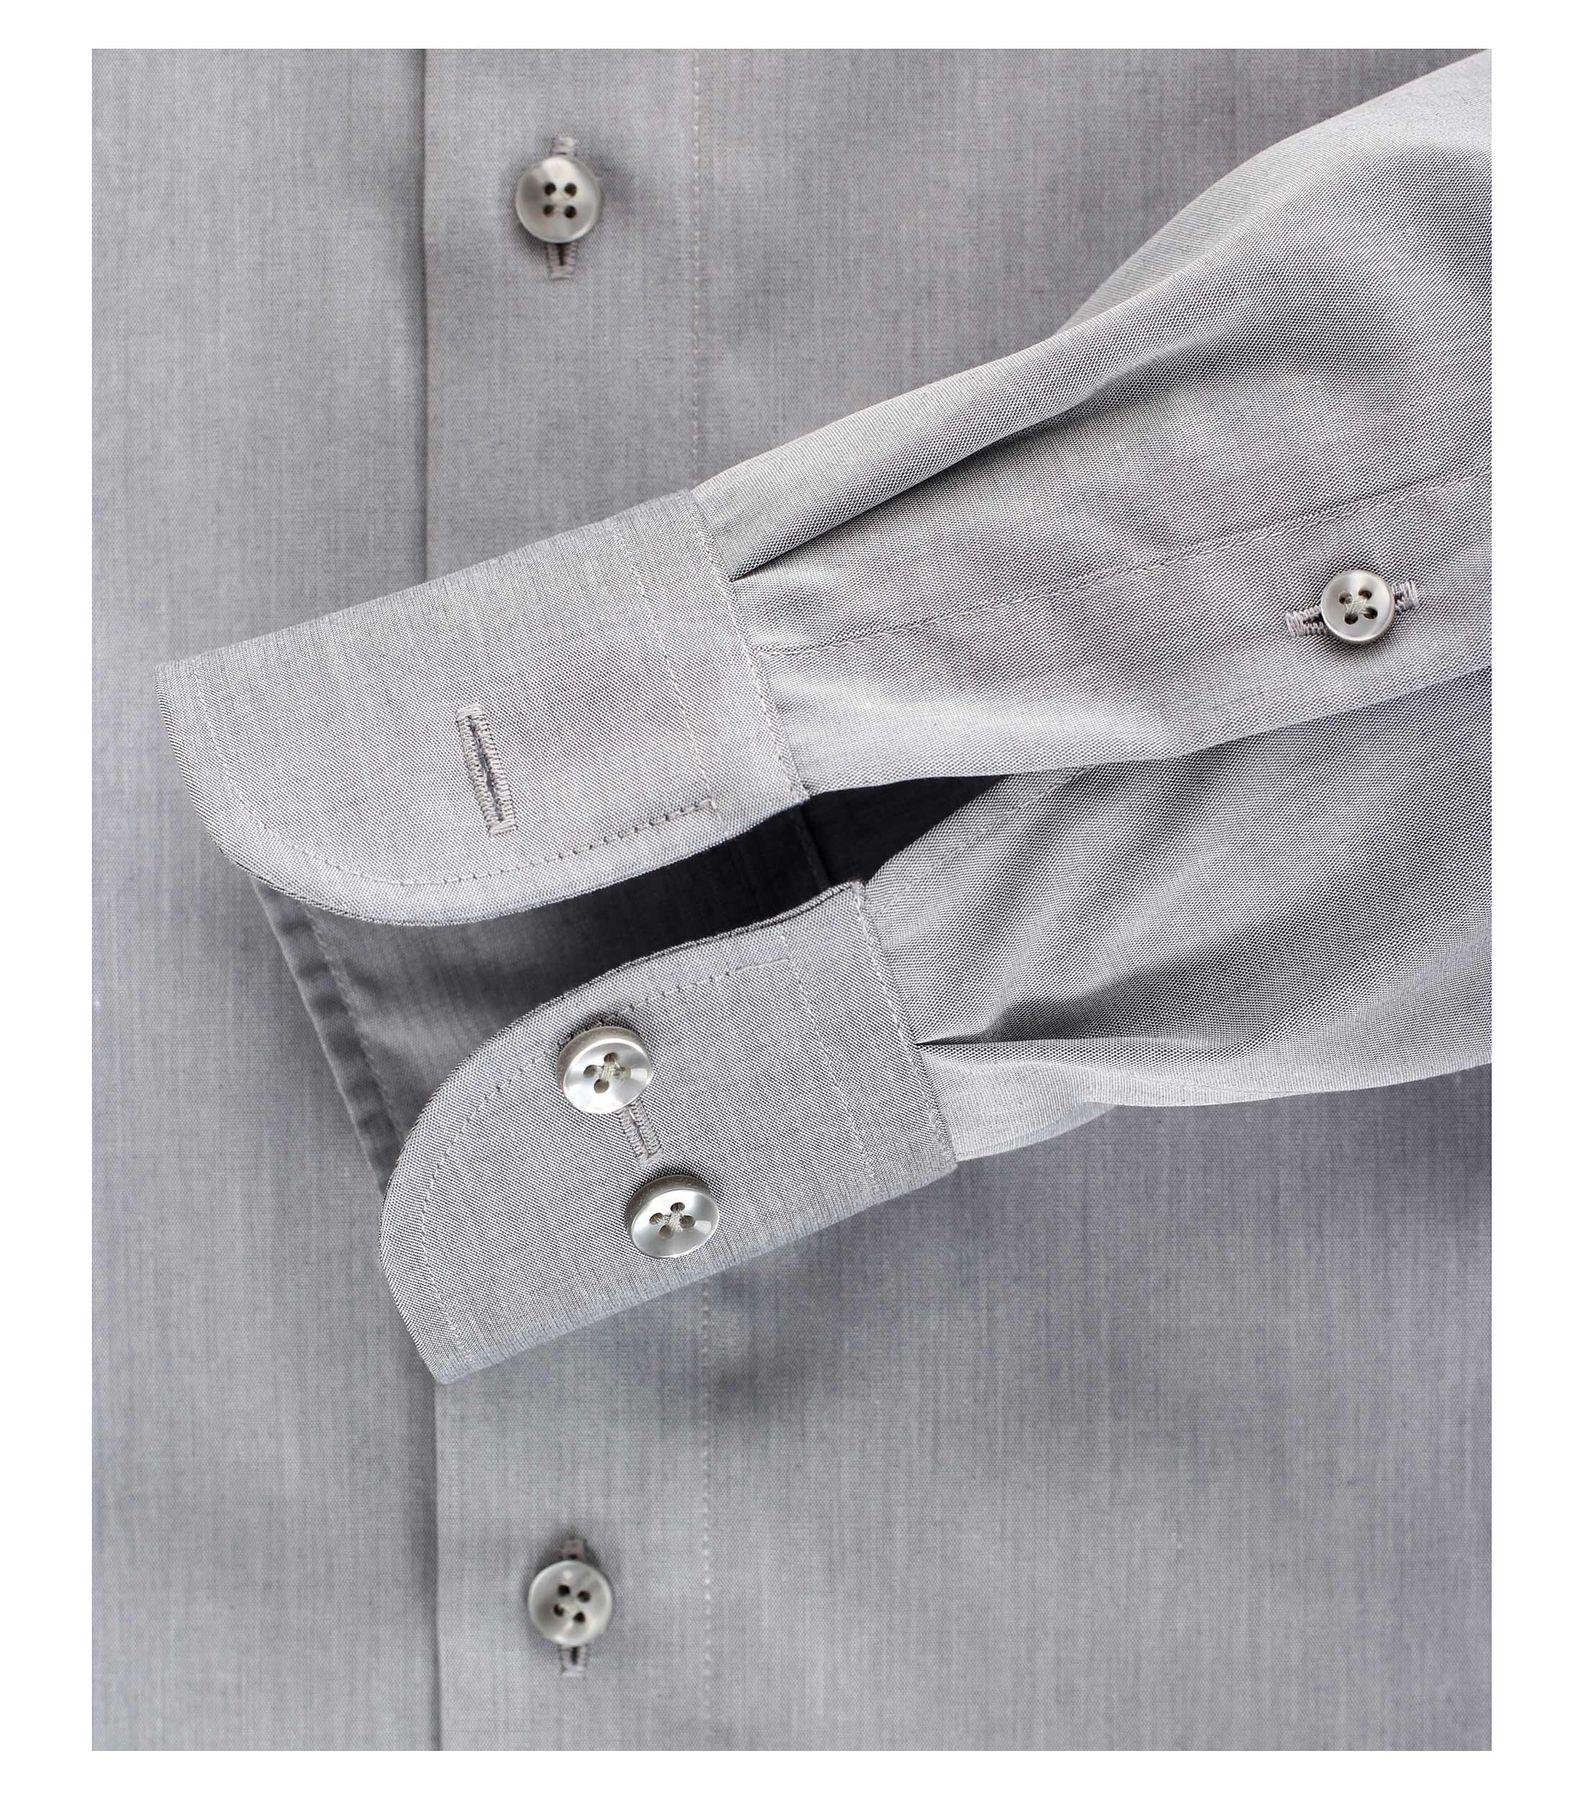 Casa Moda - Comfort Fit - Bügelfreies Herren Business Langarm Hemd verschiedene Farben (006060A) – Bild 4